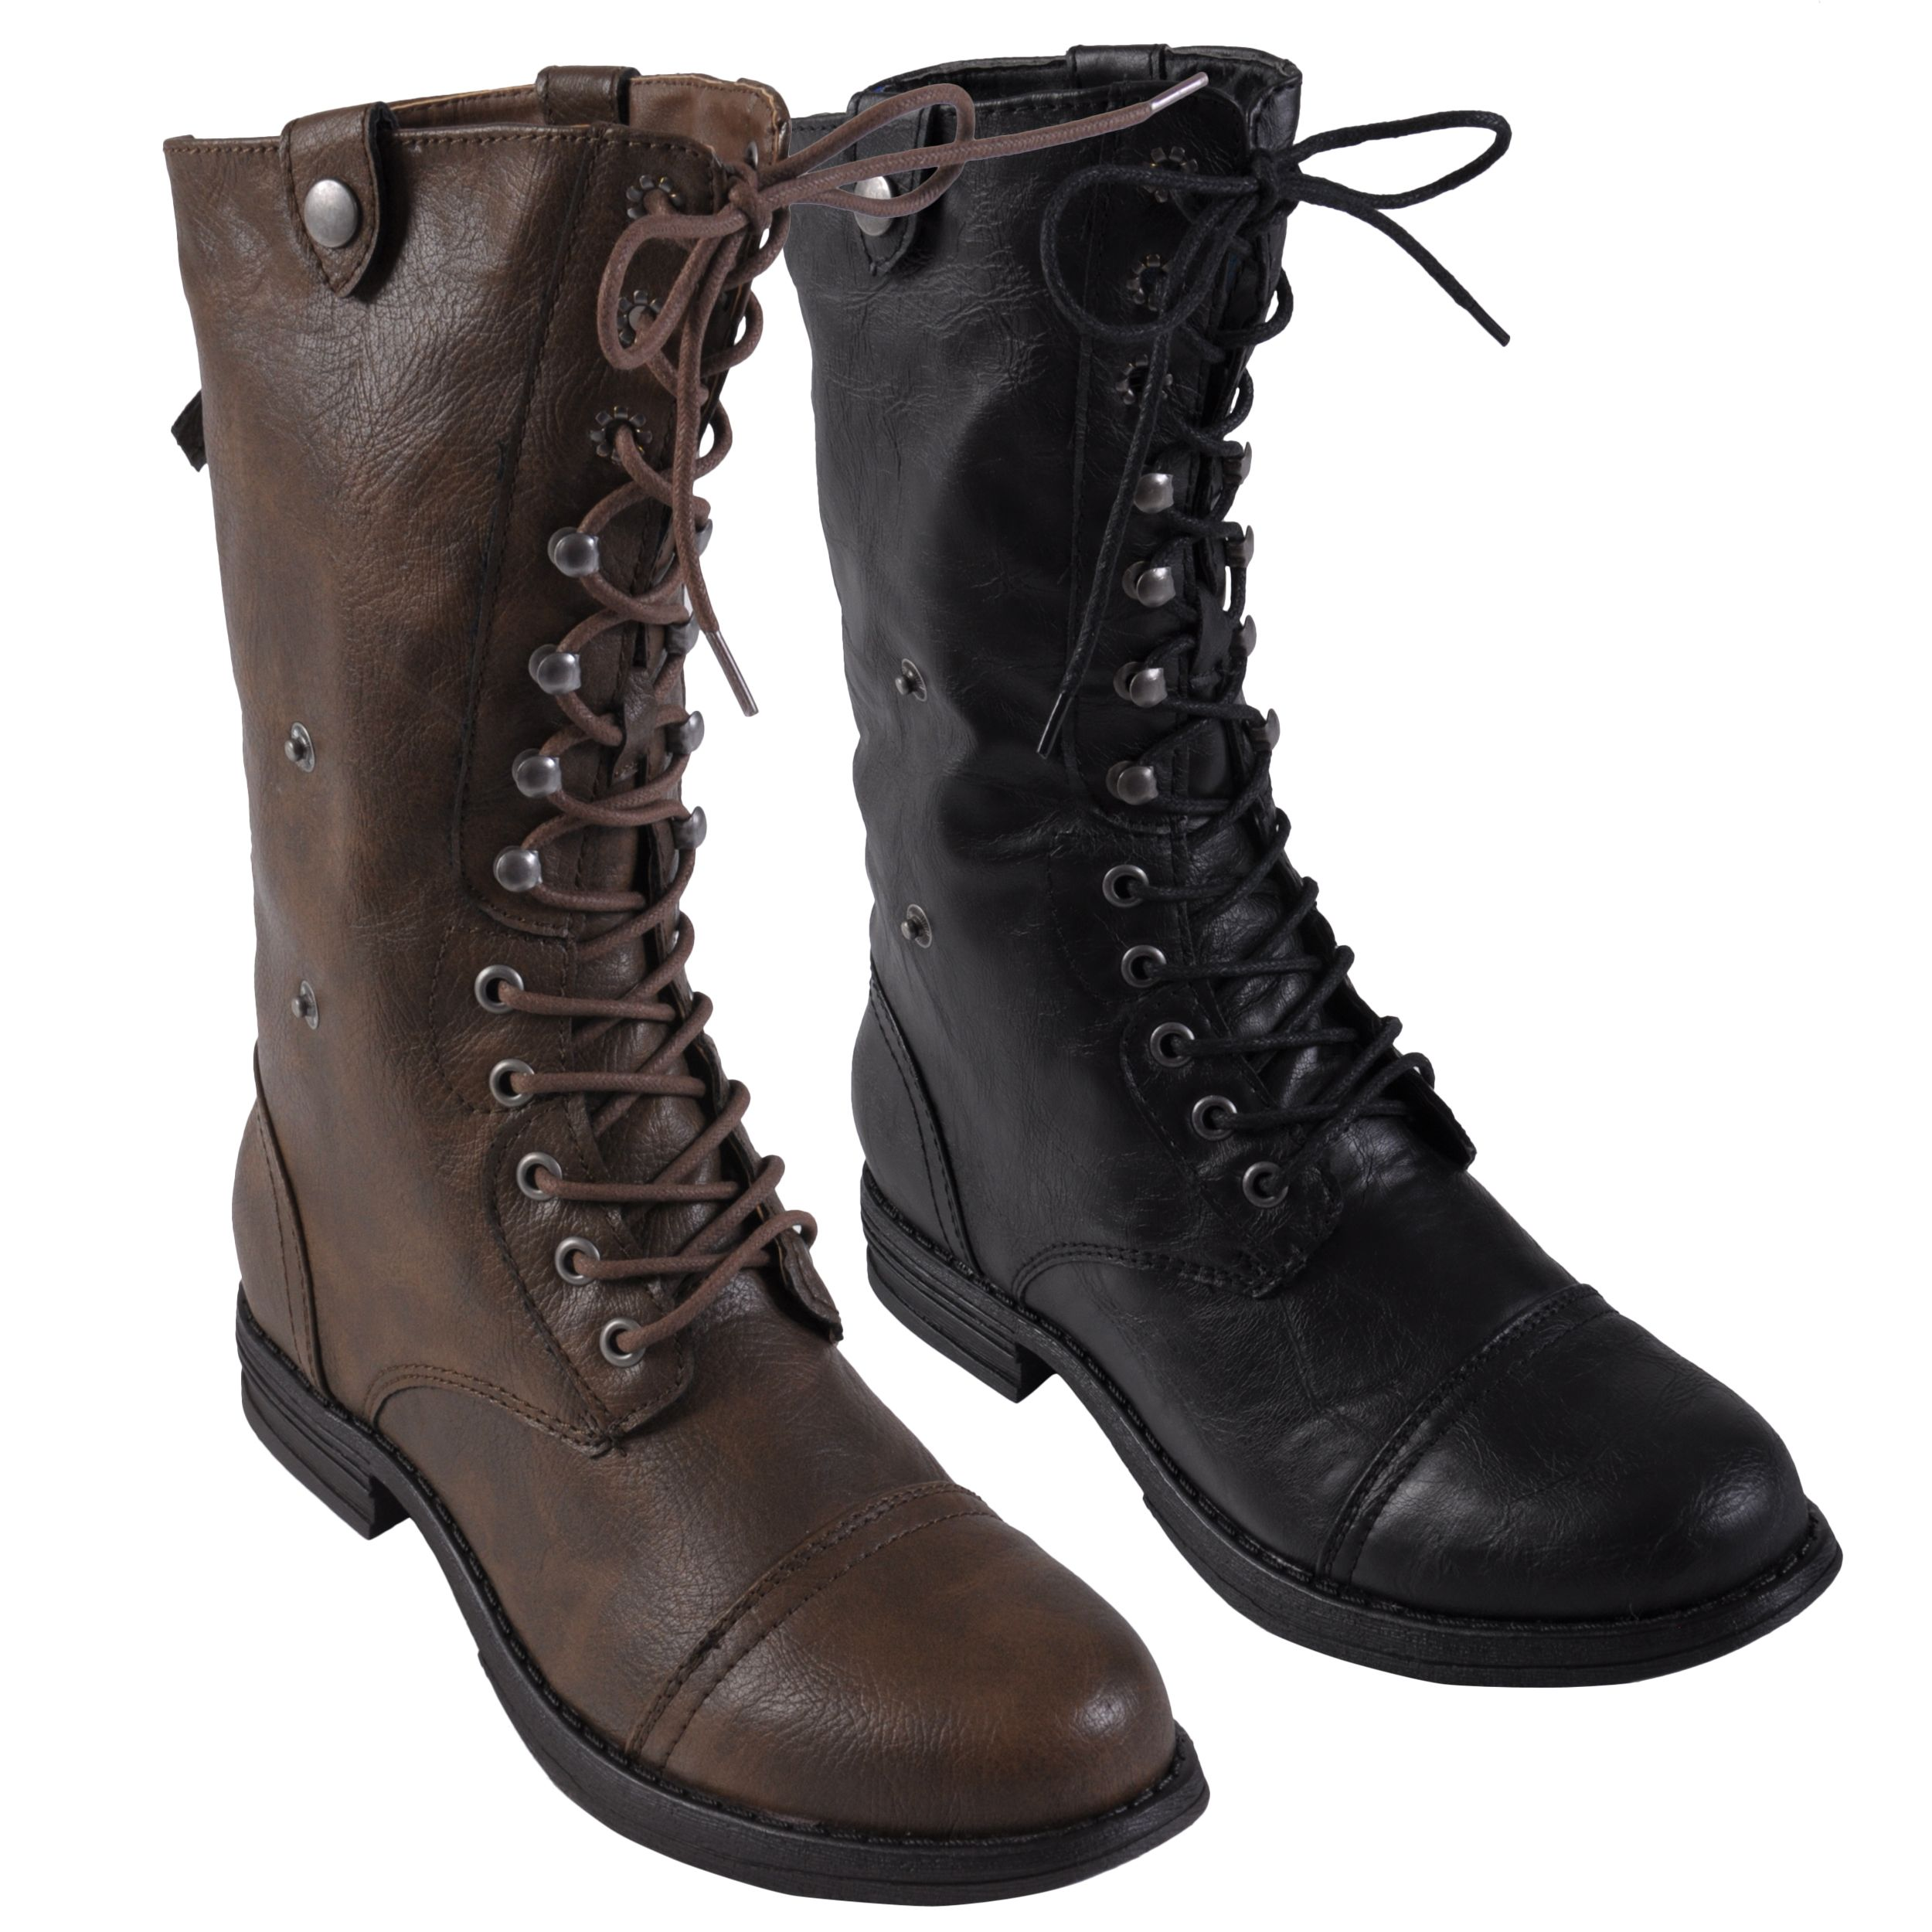 Best Design Madden Girl Combat Boots